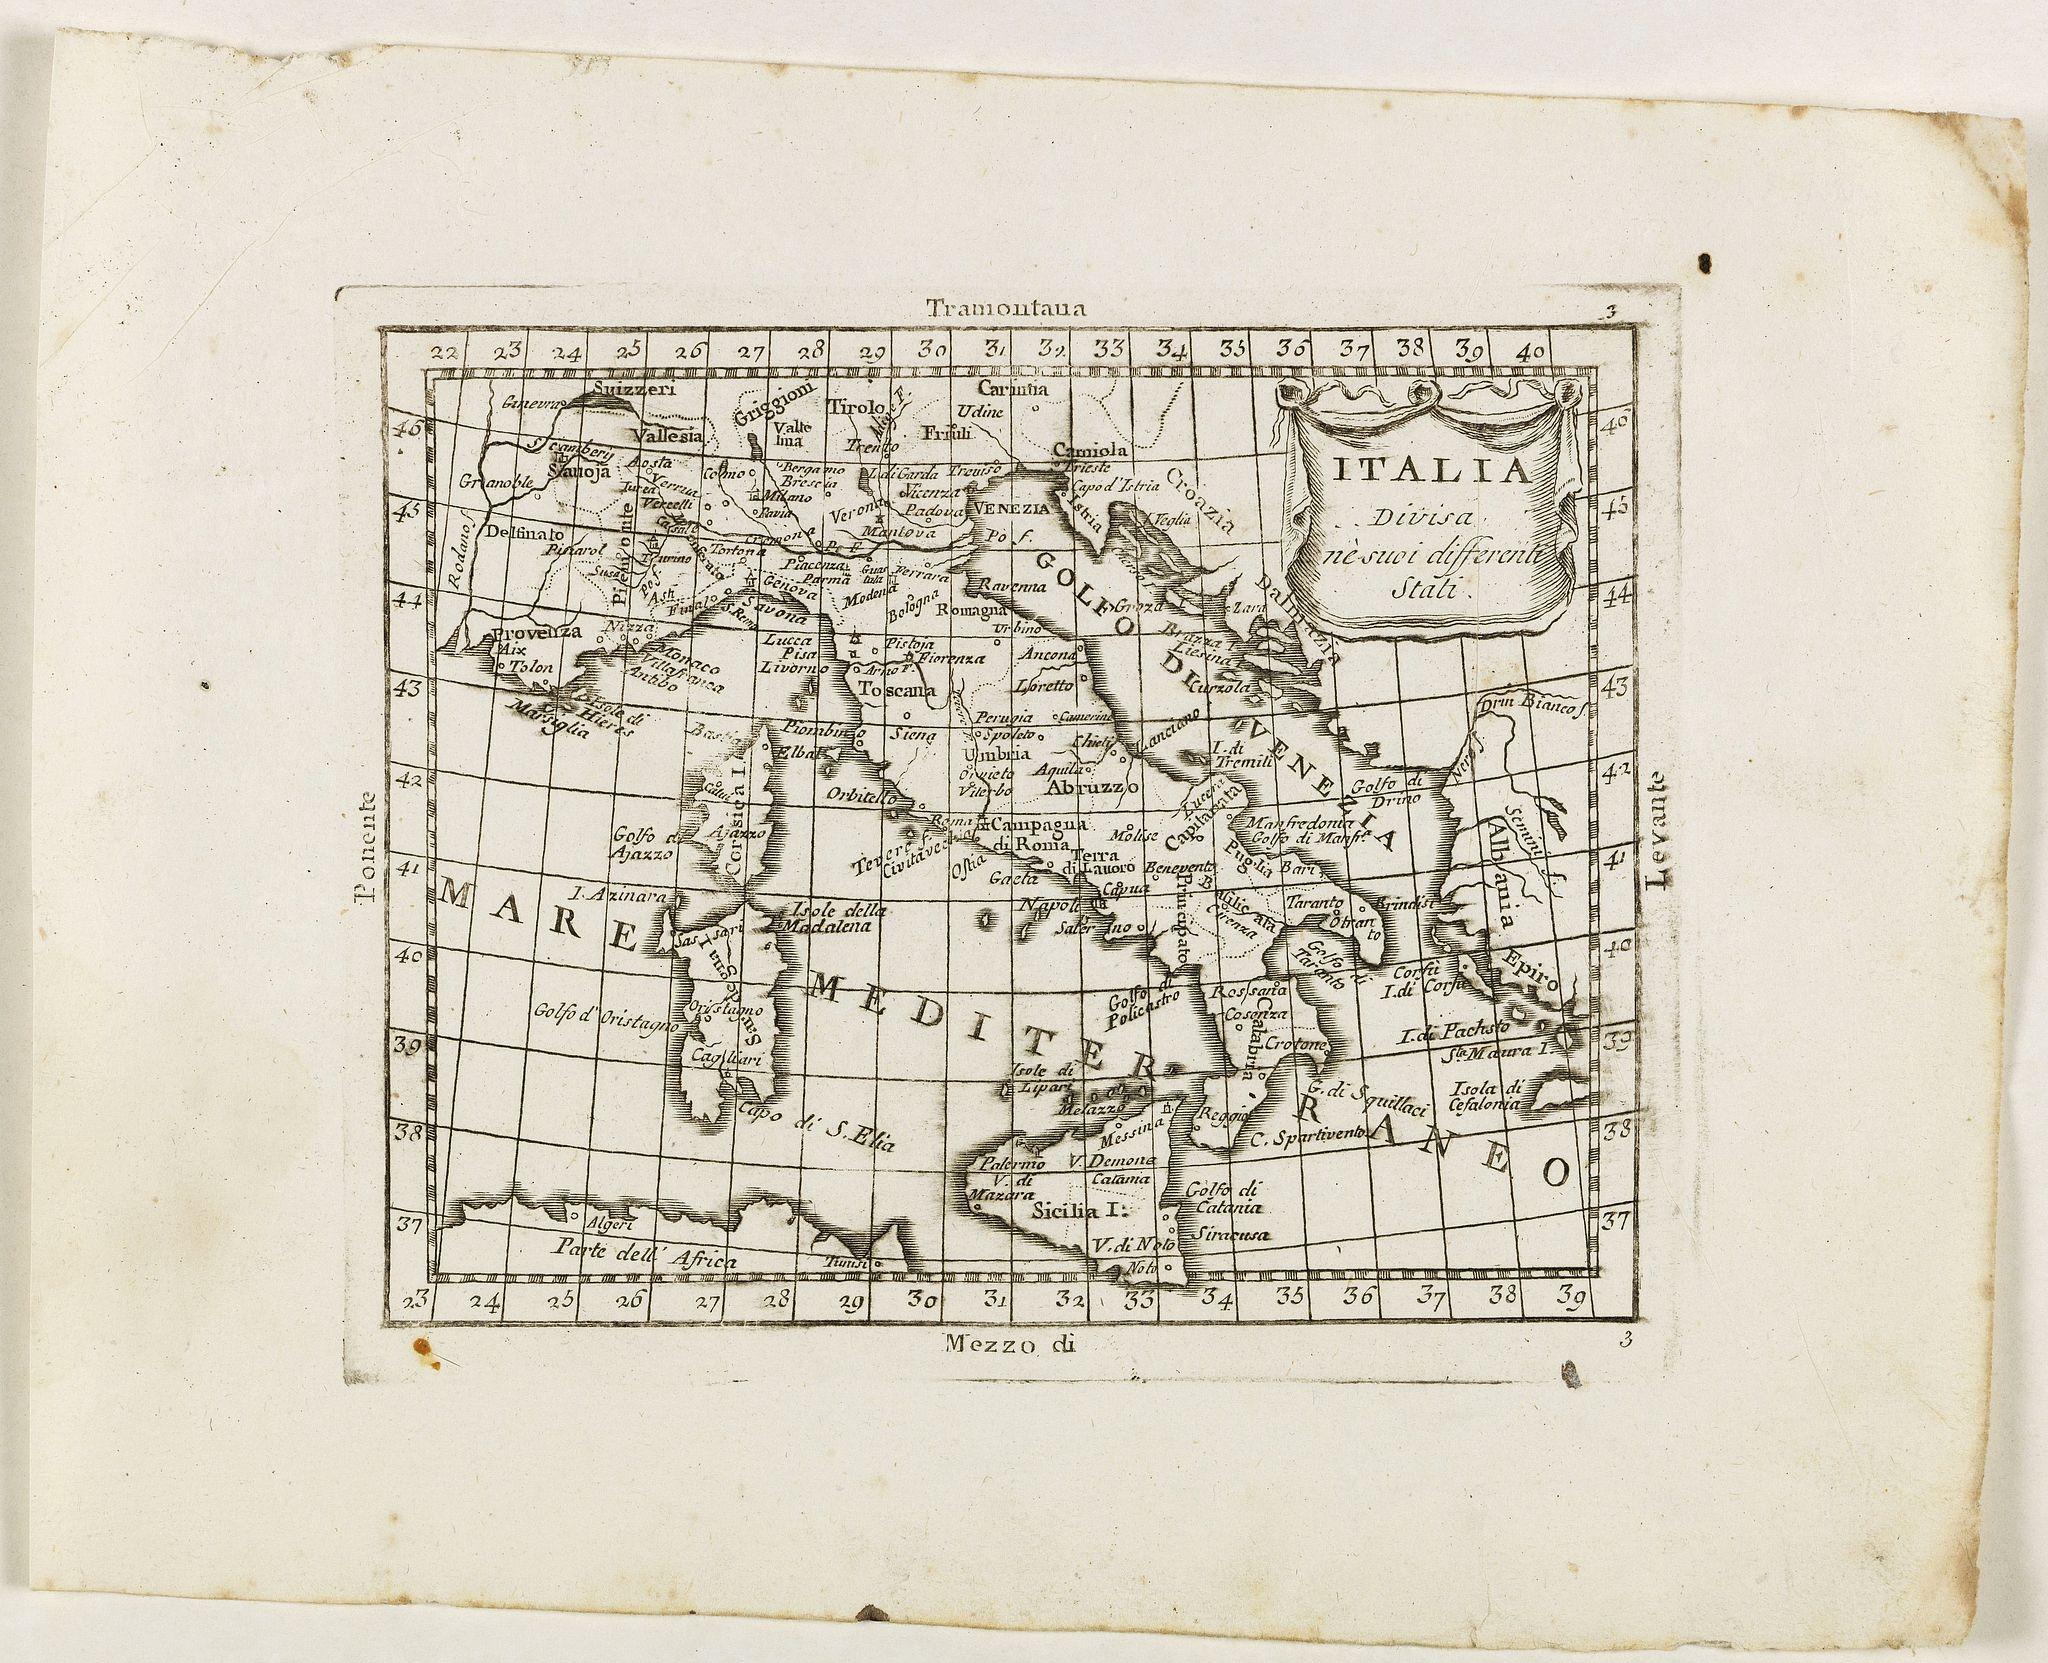 ZEMPEL, G. -  Italia divisa né suoi differenti stati.